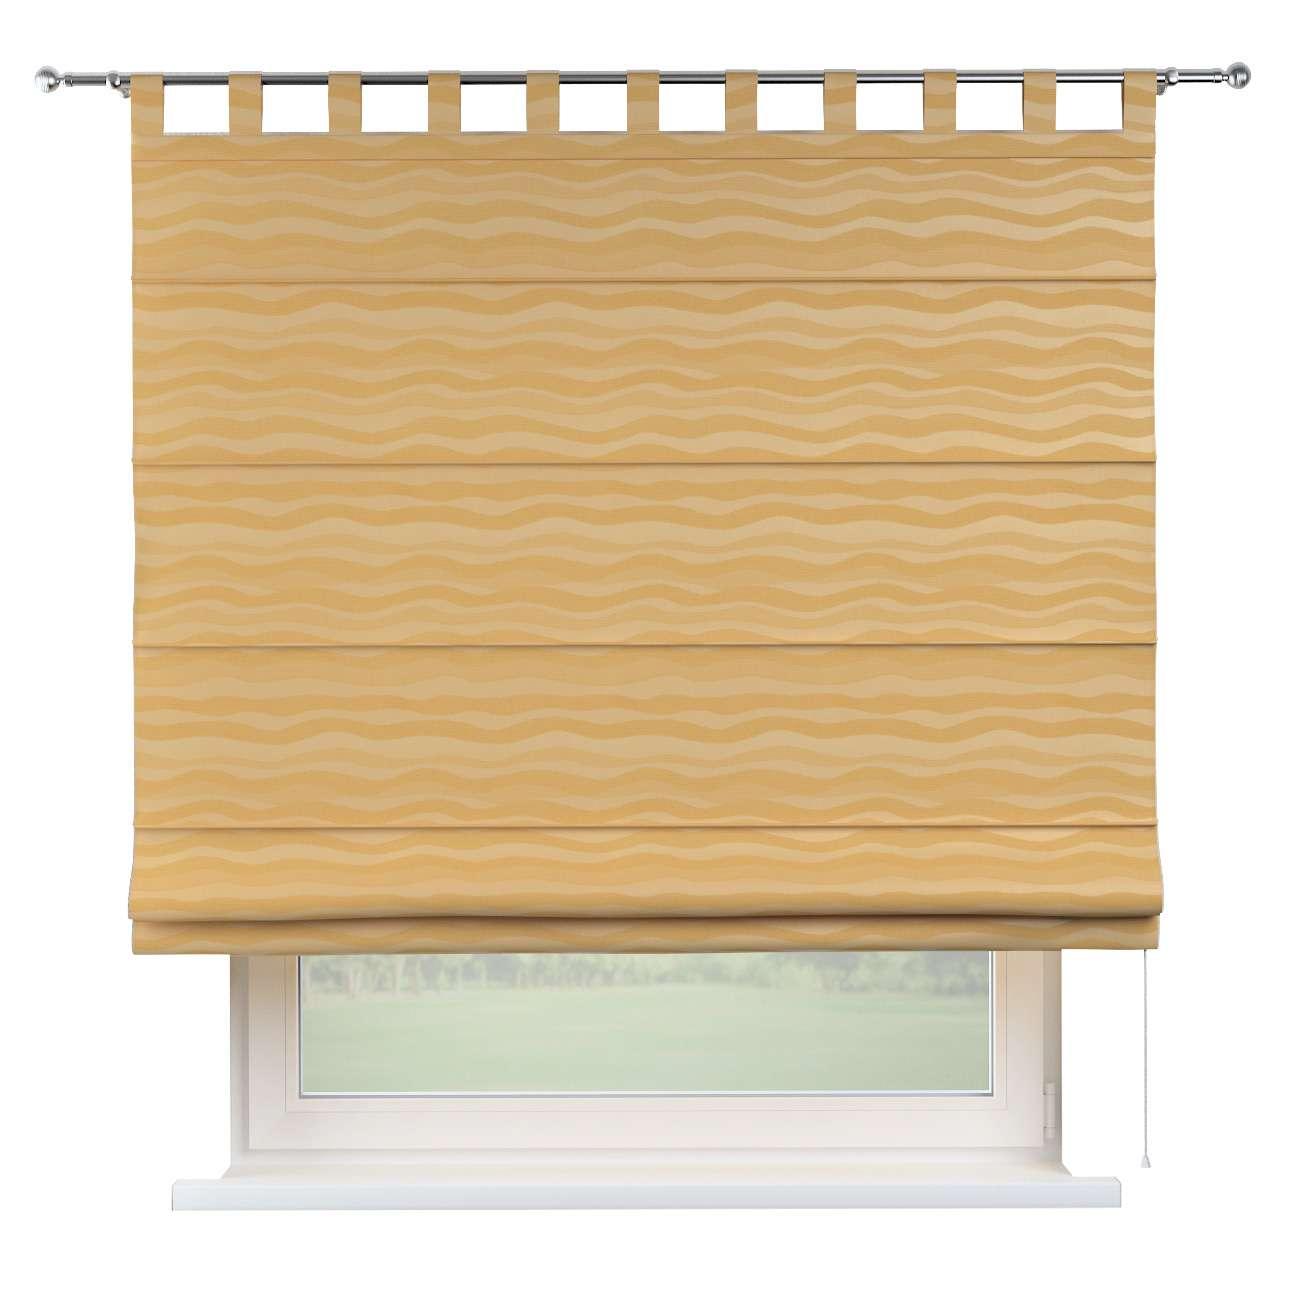 raffrollo verona gold 130 170 cm damasco modecentren imc. Black Bedroom Furniture Sets. Home Design Ideas